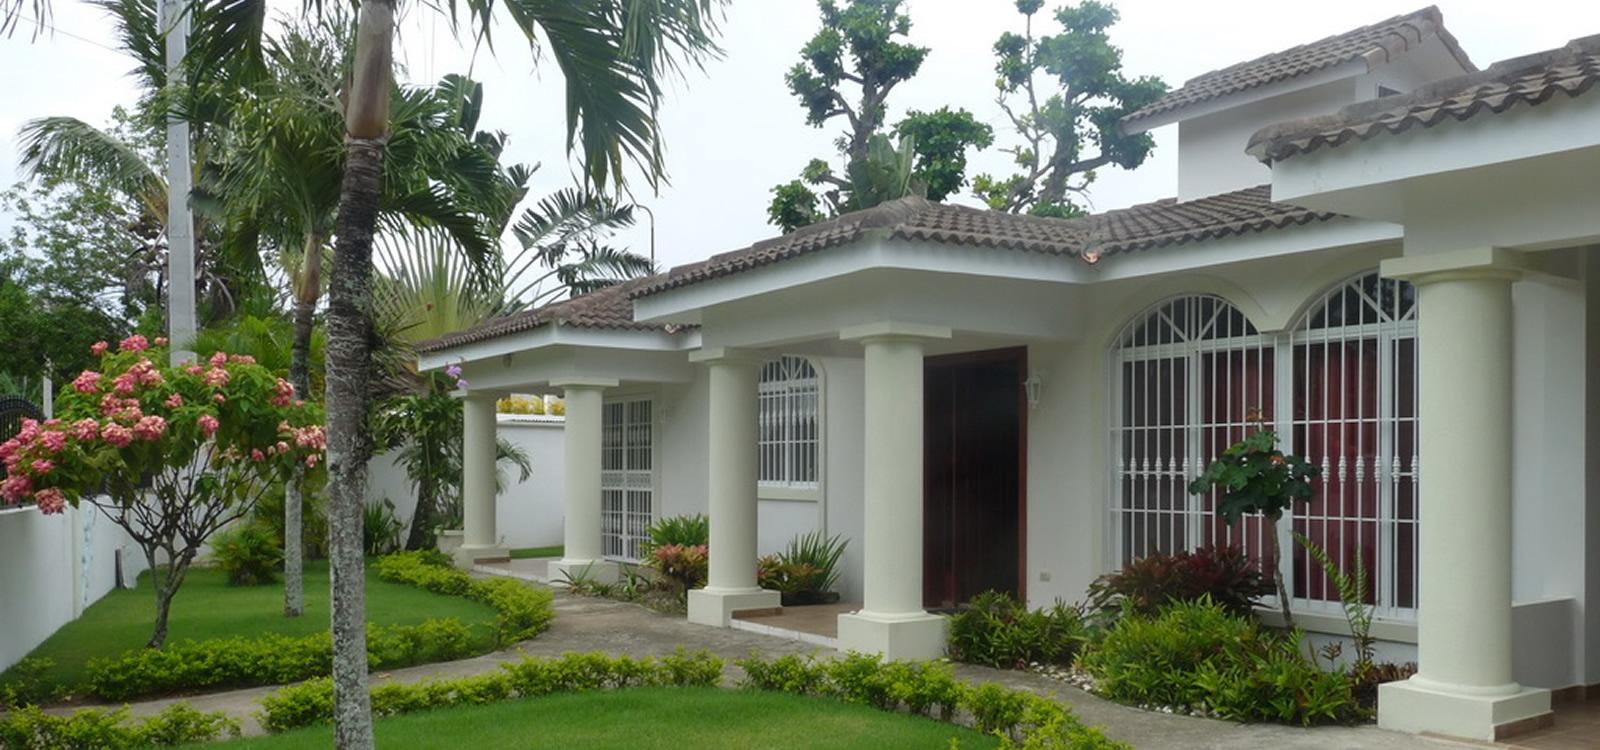 3 Bedroom House For Sale Cabarete Dominican Republic 7th Heaven Properties